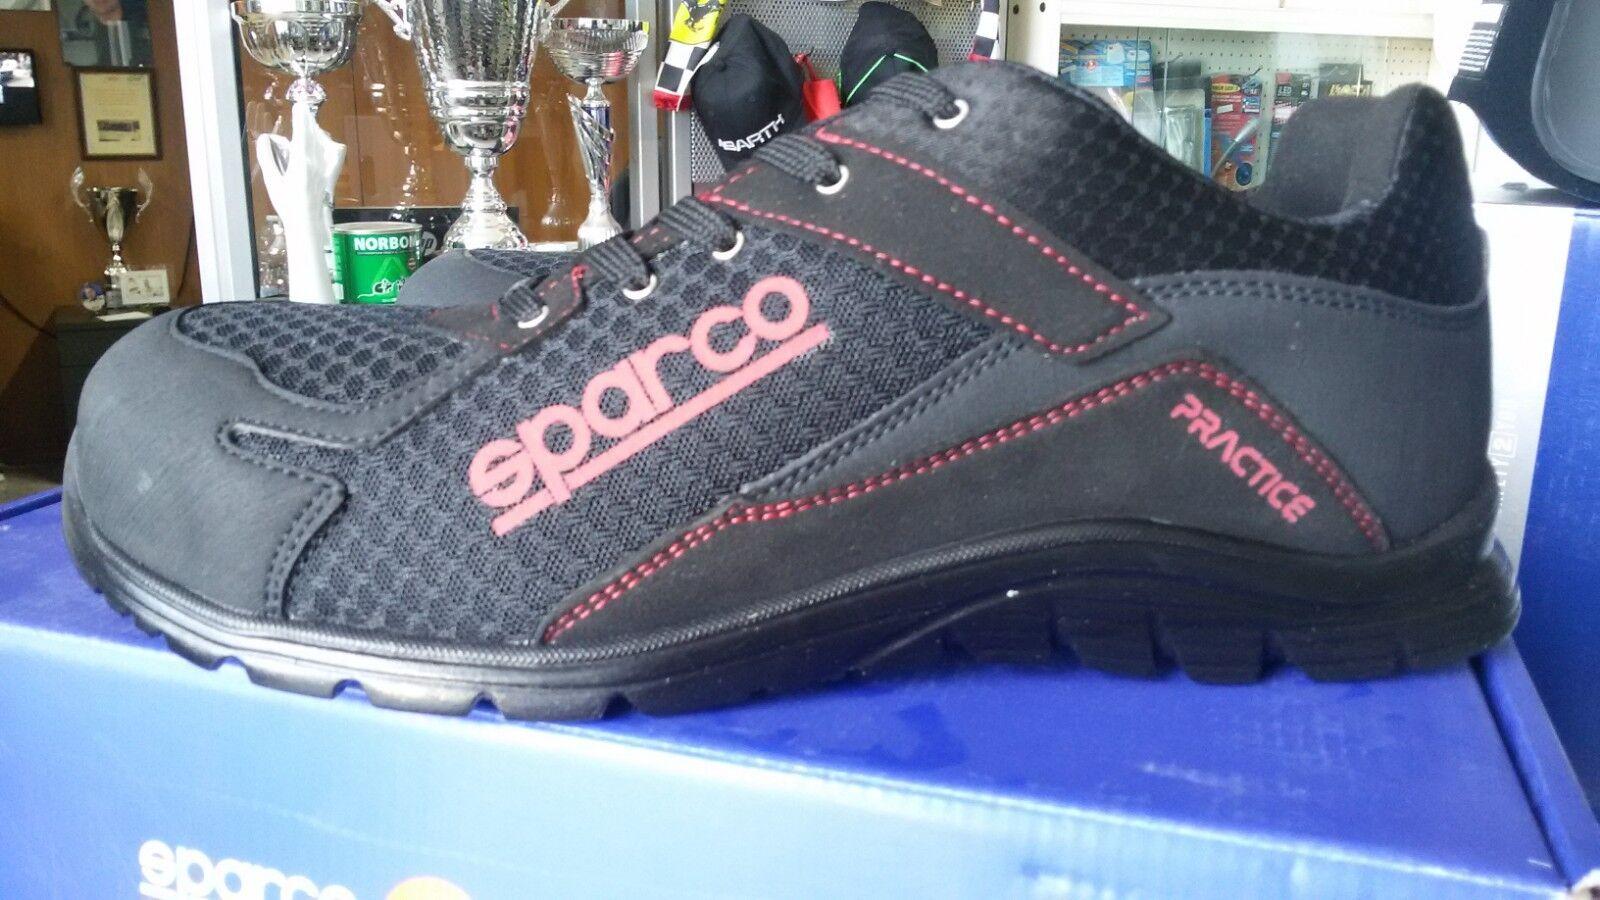 SCARPE SPARCO ANTINFORTUNISTICA PRACTICE ULTRALEGGERA S1P TG 43 43 43 - SAFETY scarpe 41222e